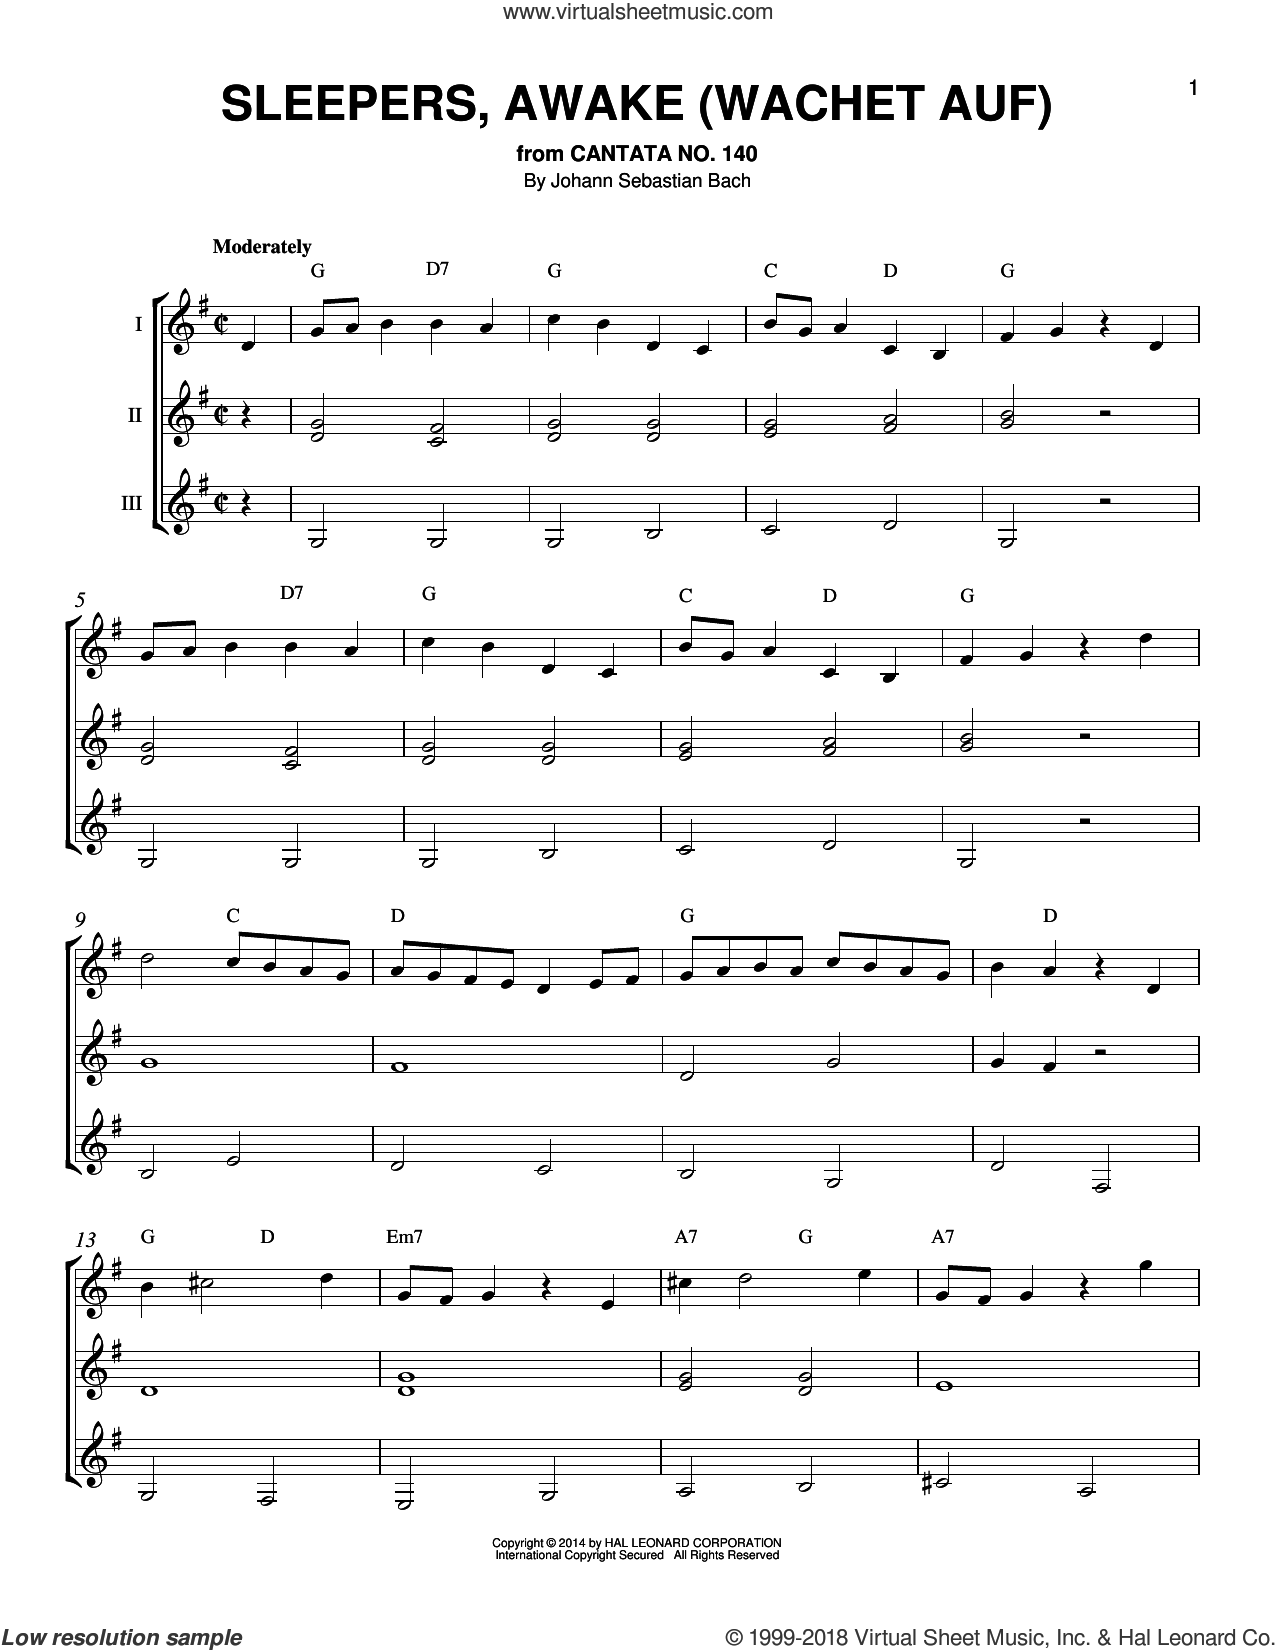 Sleepers, Awake (Wachet Auf) sheet music for guitar ensemble by Johann Sebastian Bach, classical score, intermediate skill level